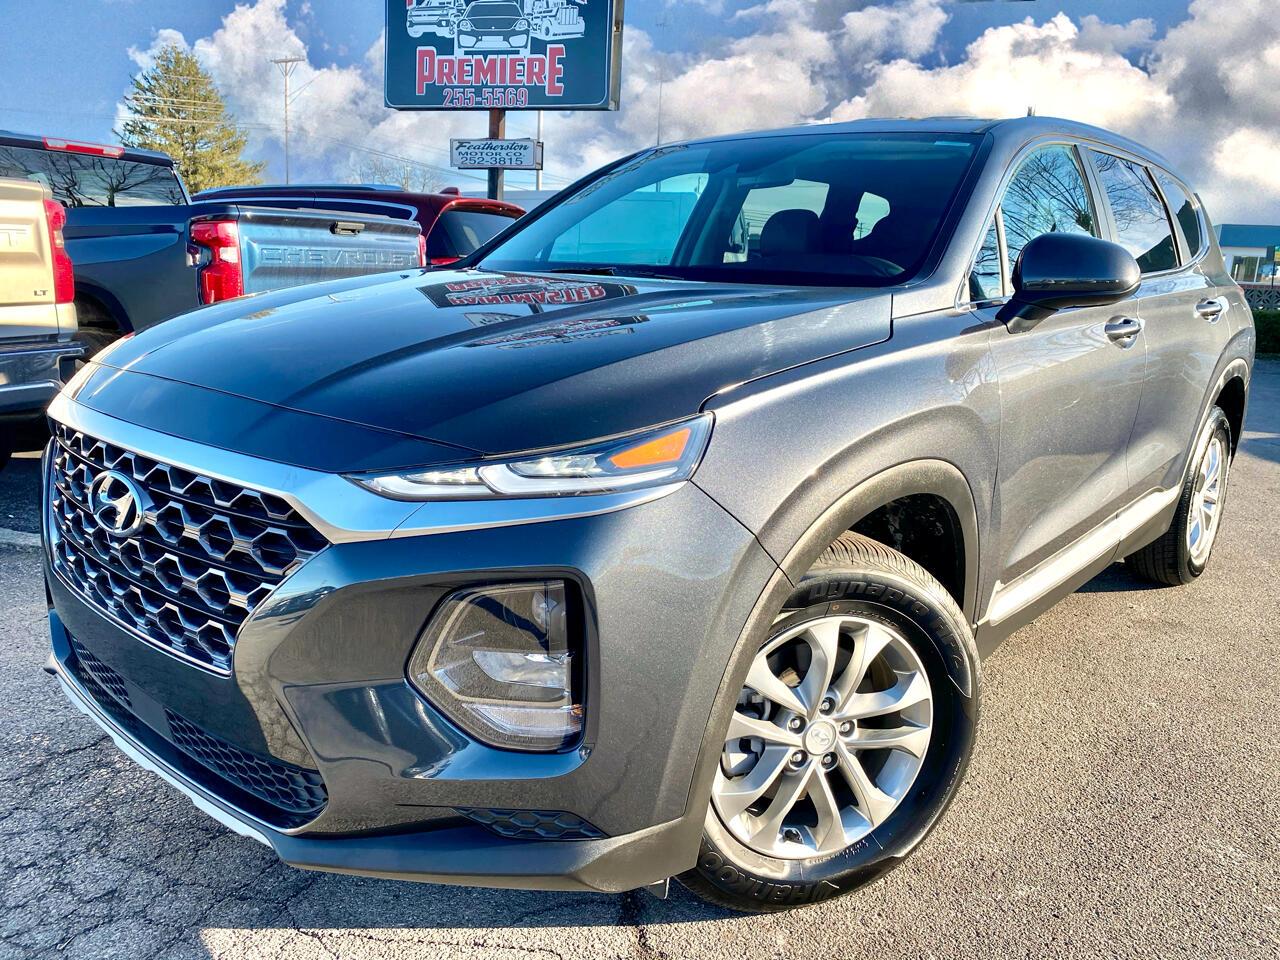 Hyundai Santa Fe SE 2.4L Auto AWD 2020